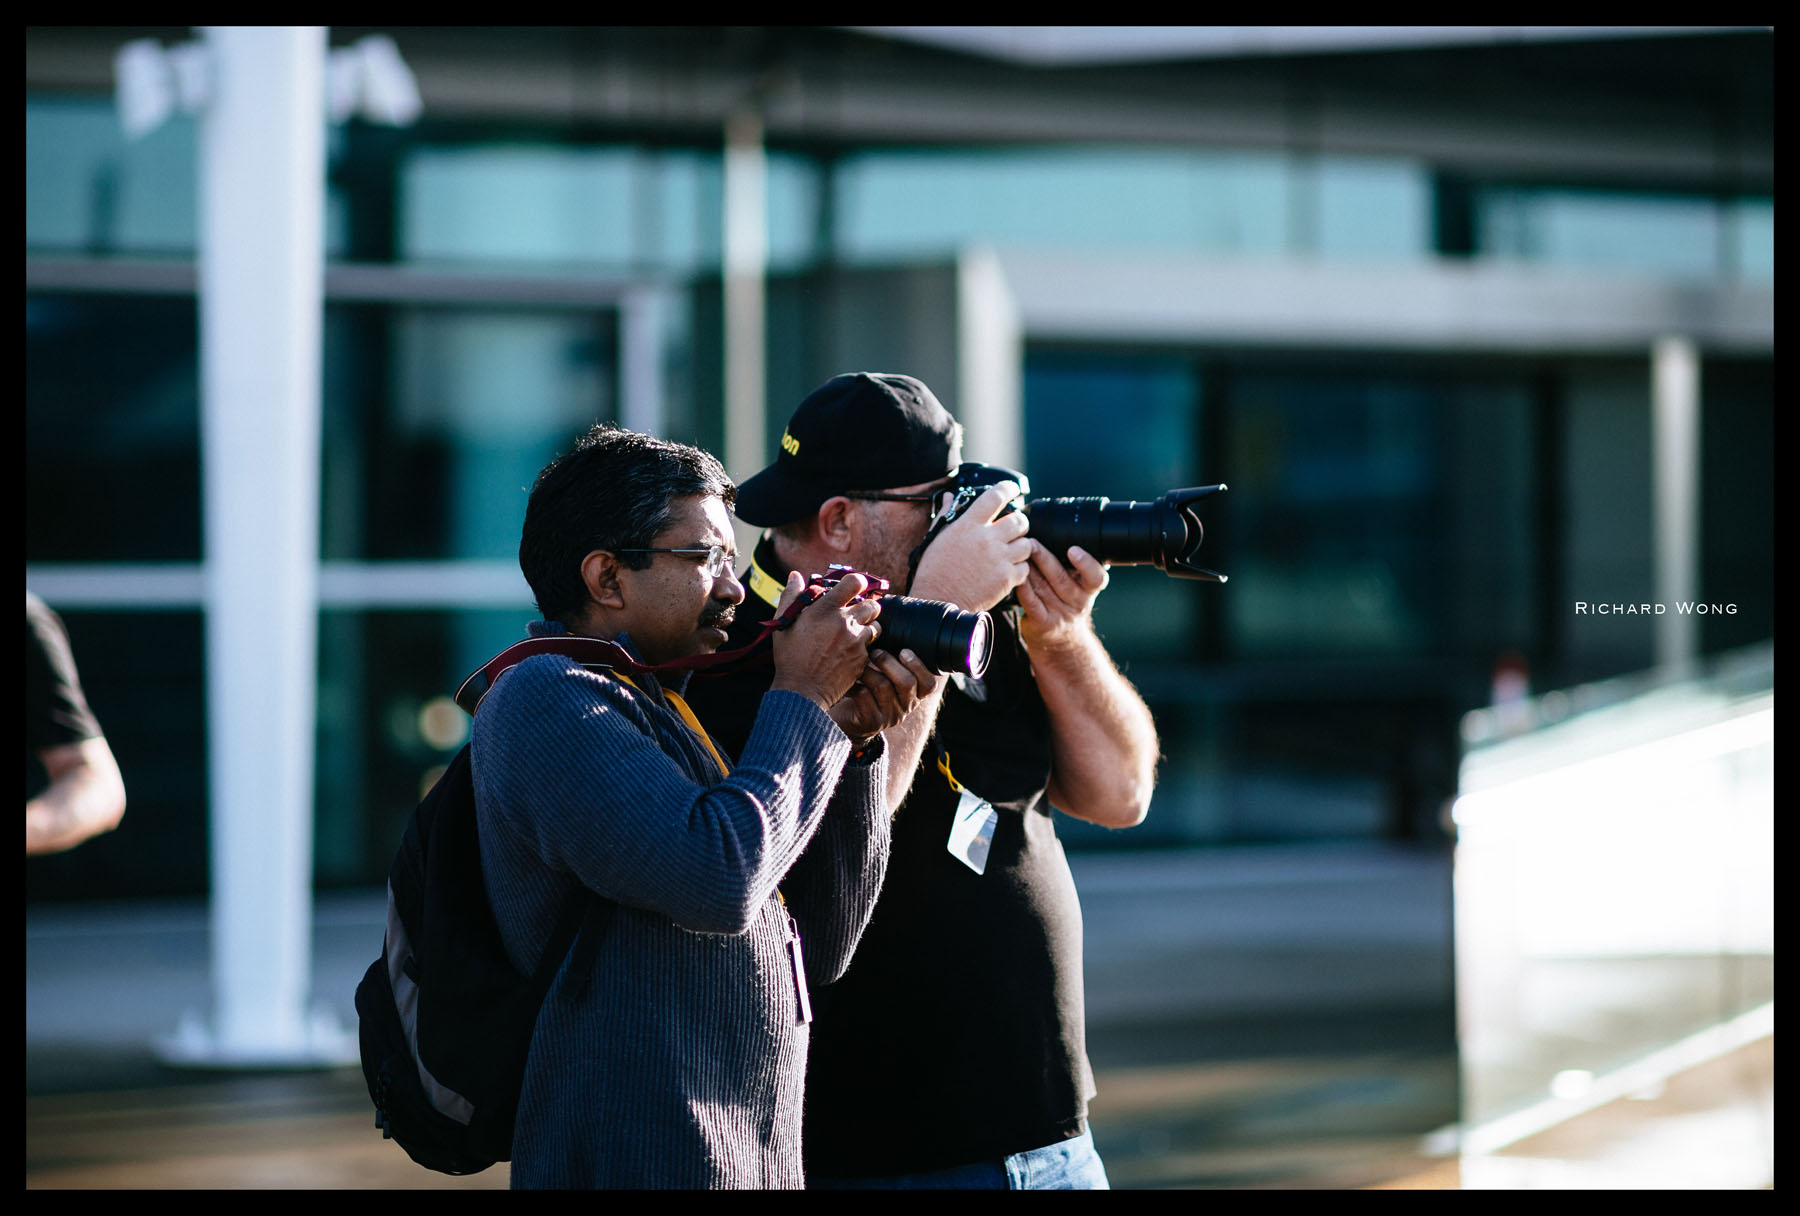 Nikon-Auckland-Photo-Day-2016-20